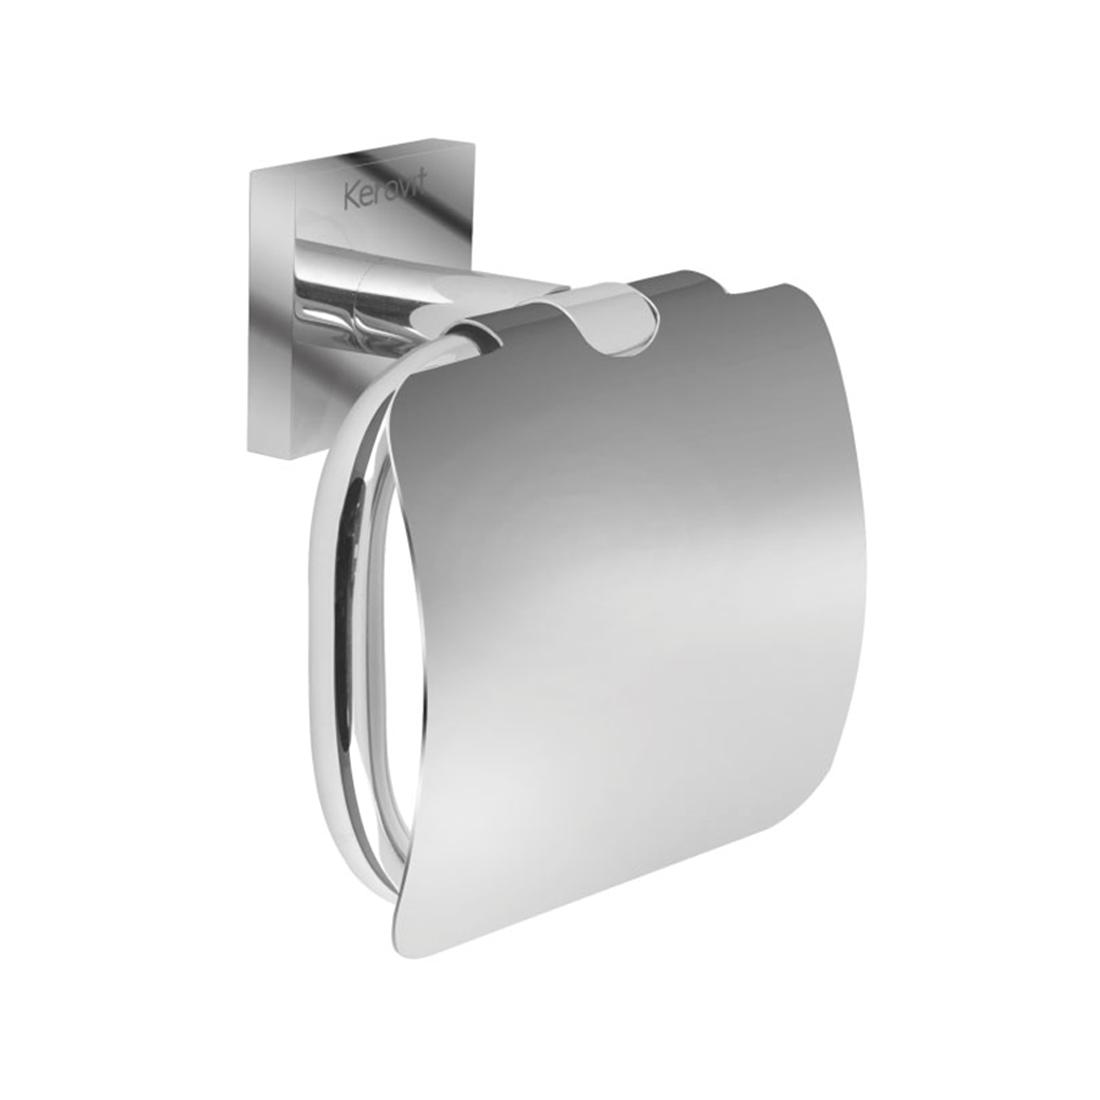 Kerovit KA990009 Square Range Toilet Paper Holder With Flap